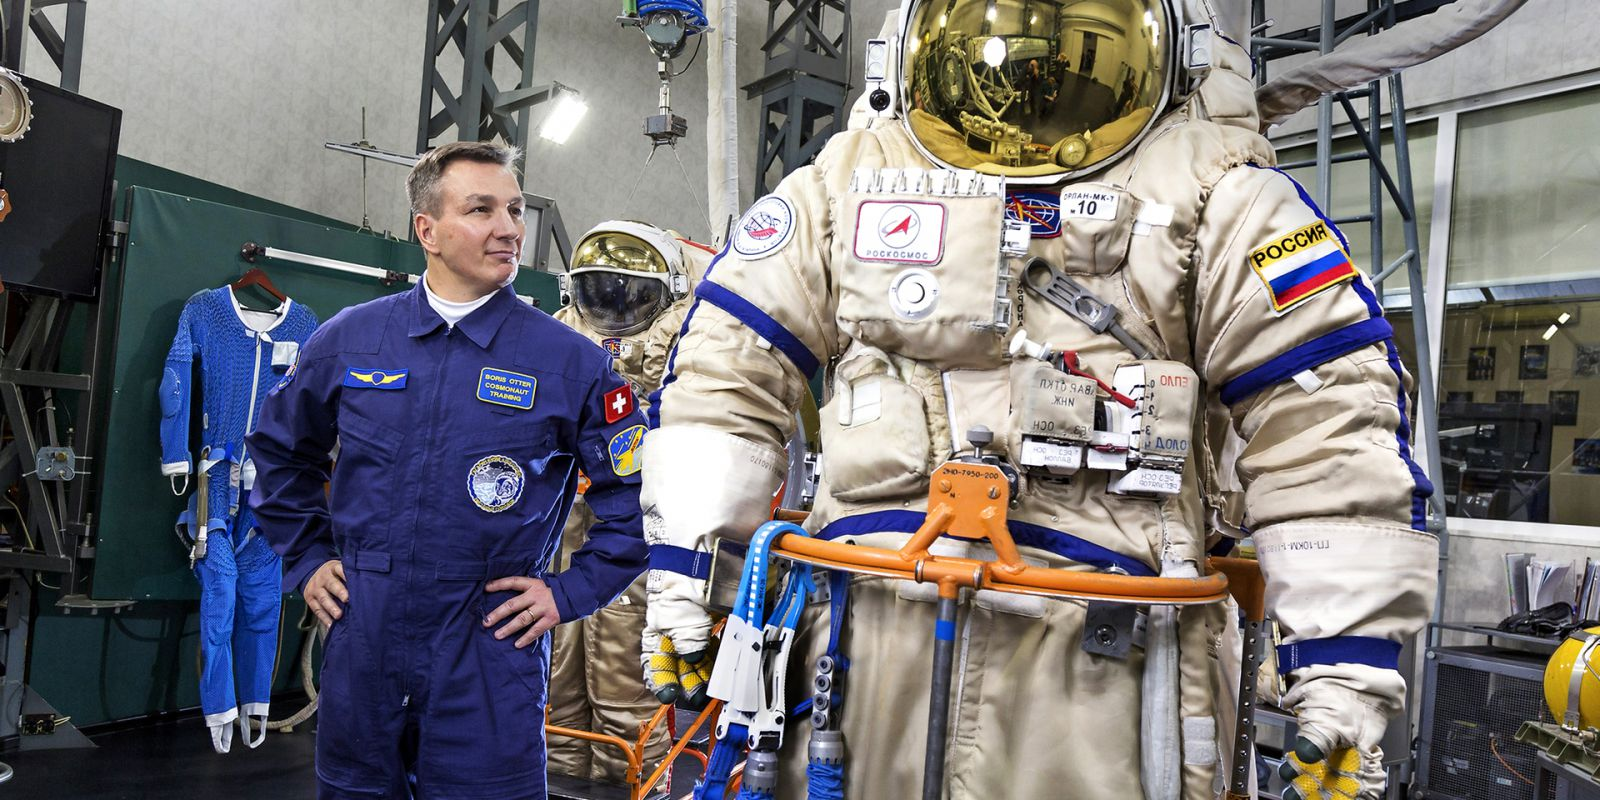 swiss space tourism boris otter